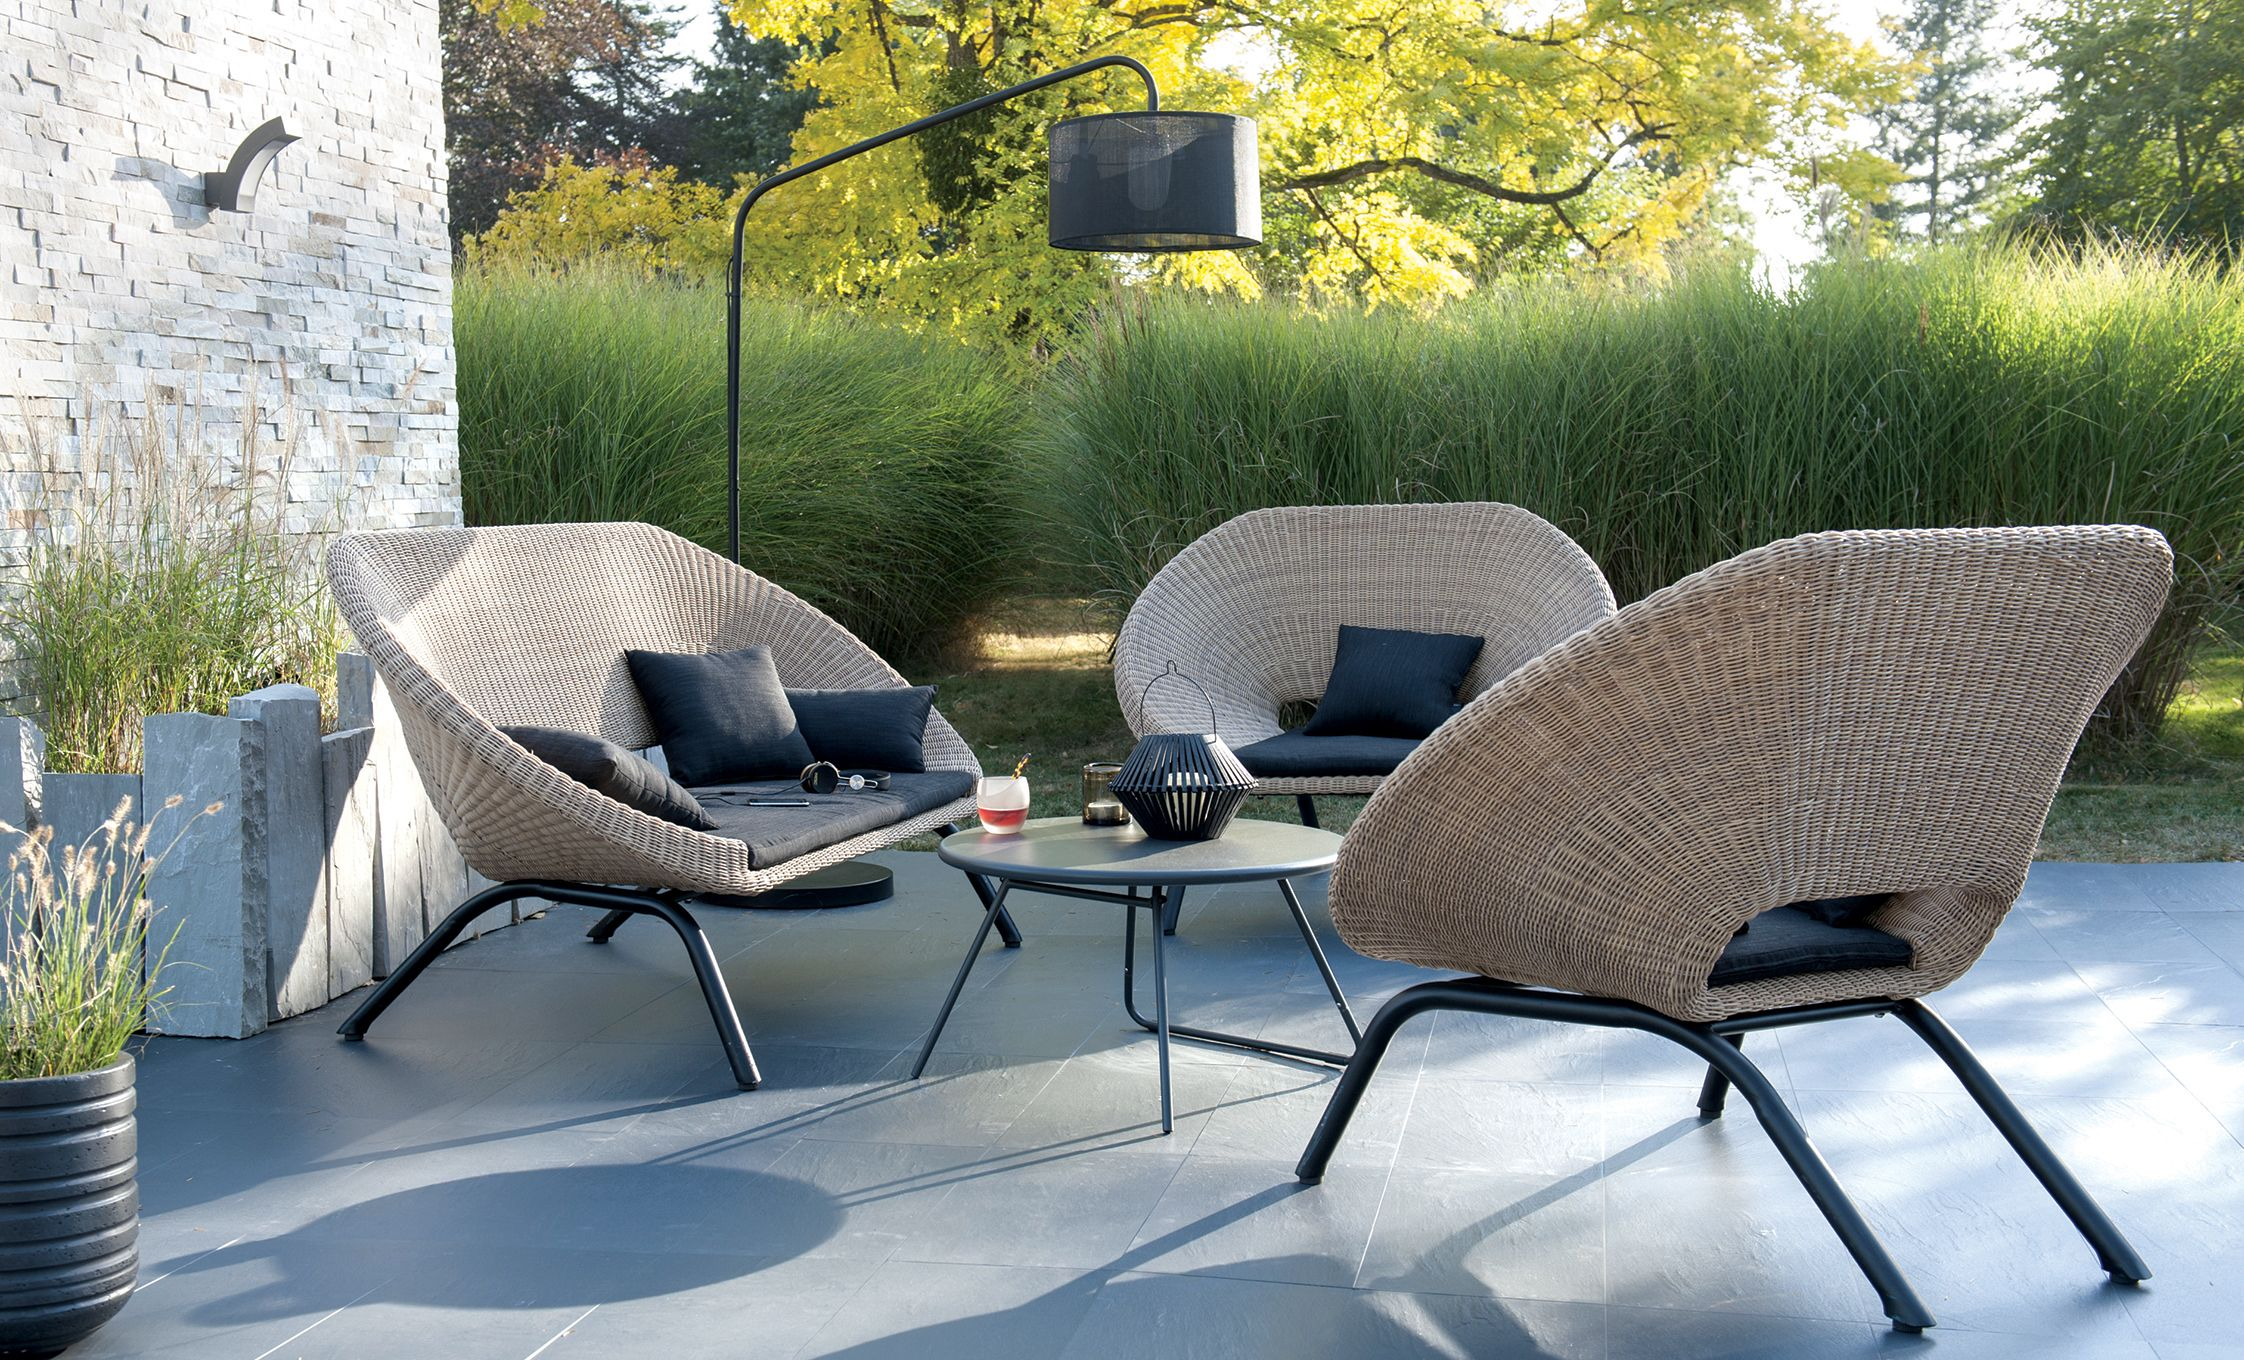 Salon De Jardin Original loa is an outdoor furniture set which has been designed to